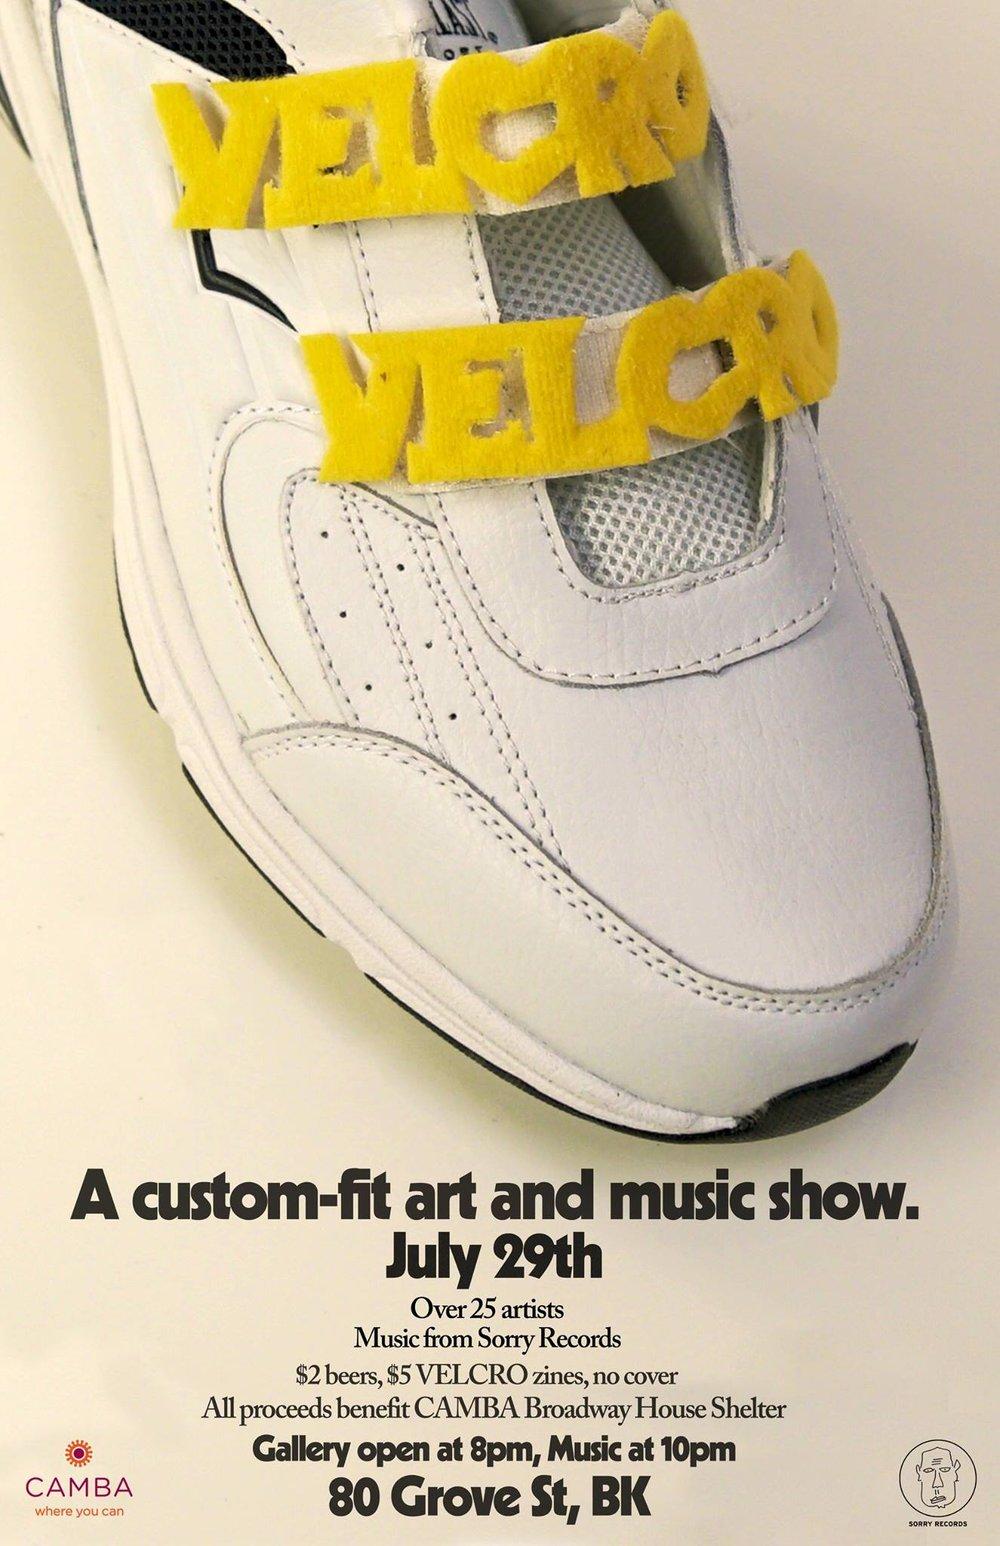 Velcro Art Show Poster (Michael Glody)